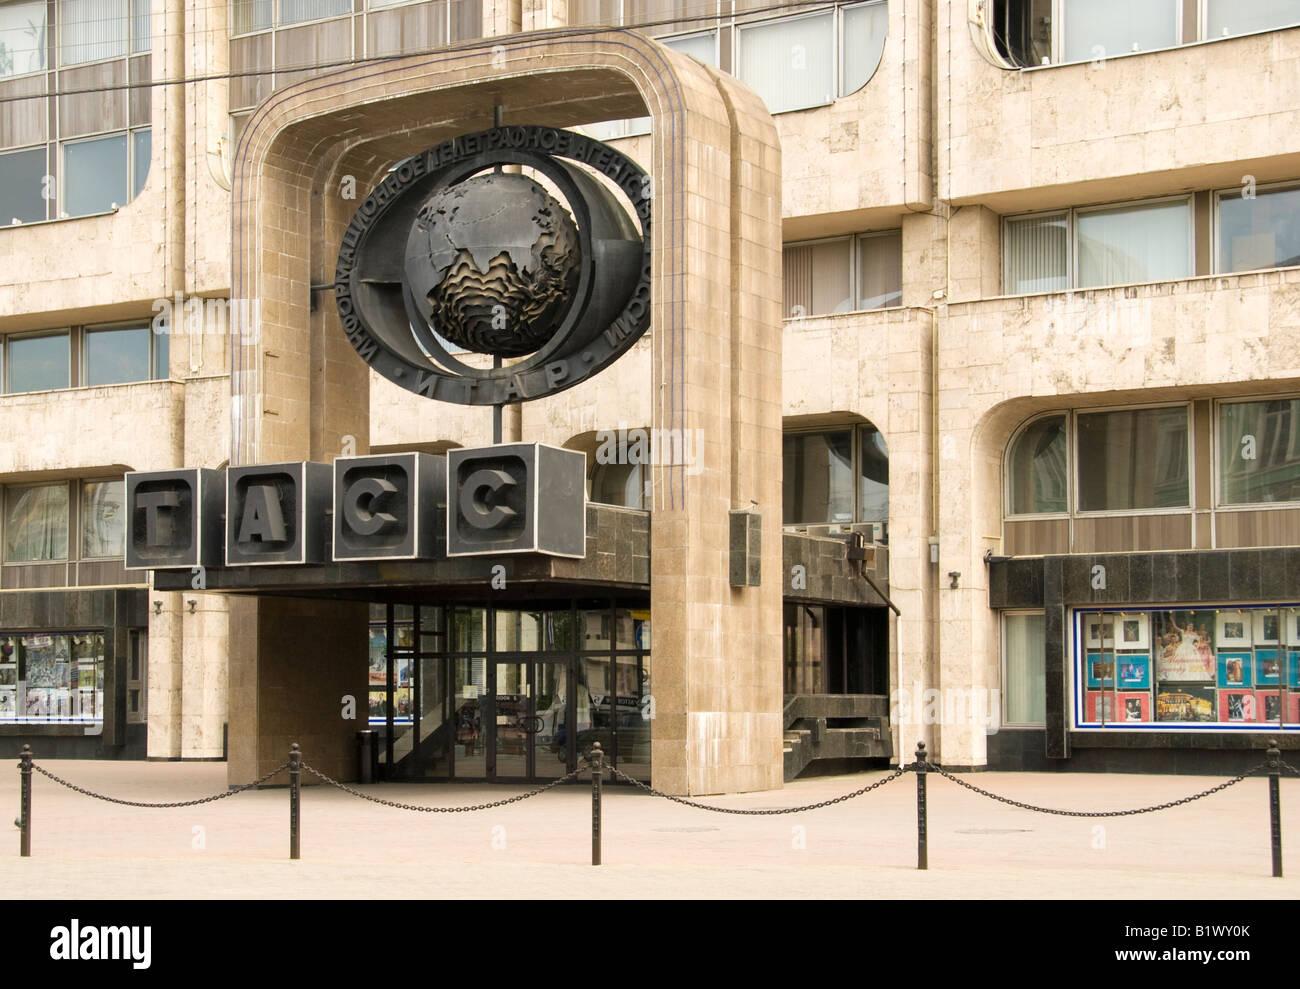 Headquarters of ITAR-TASS, the Russian state central news agency, Bolshaya Nikitskaya, Moscow, Russia - Stock Image